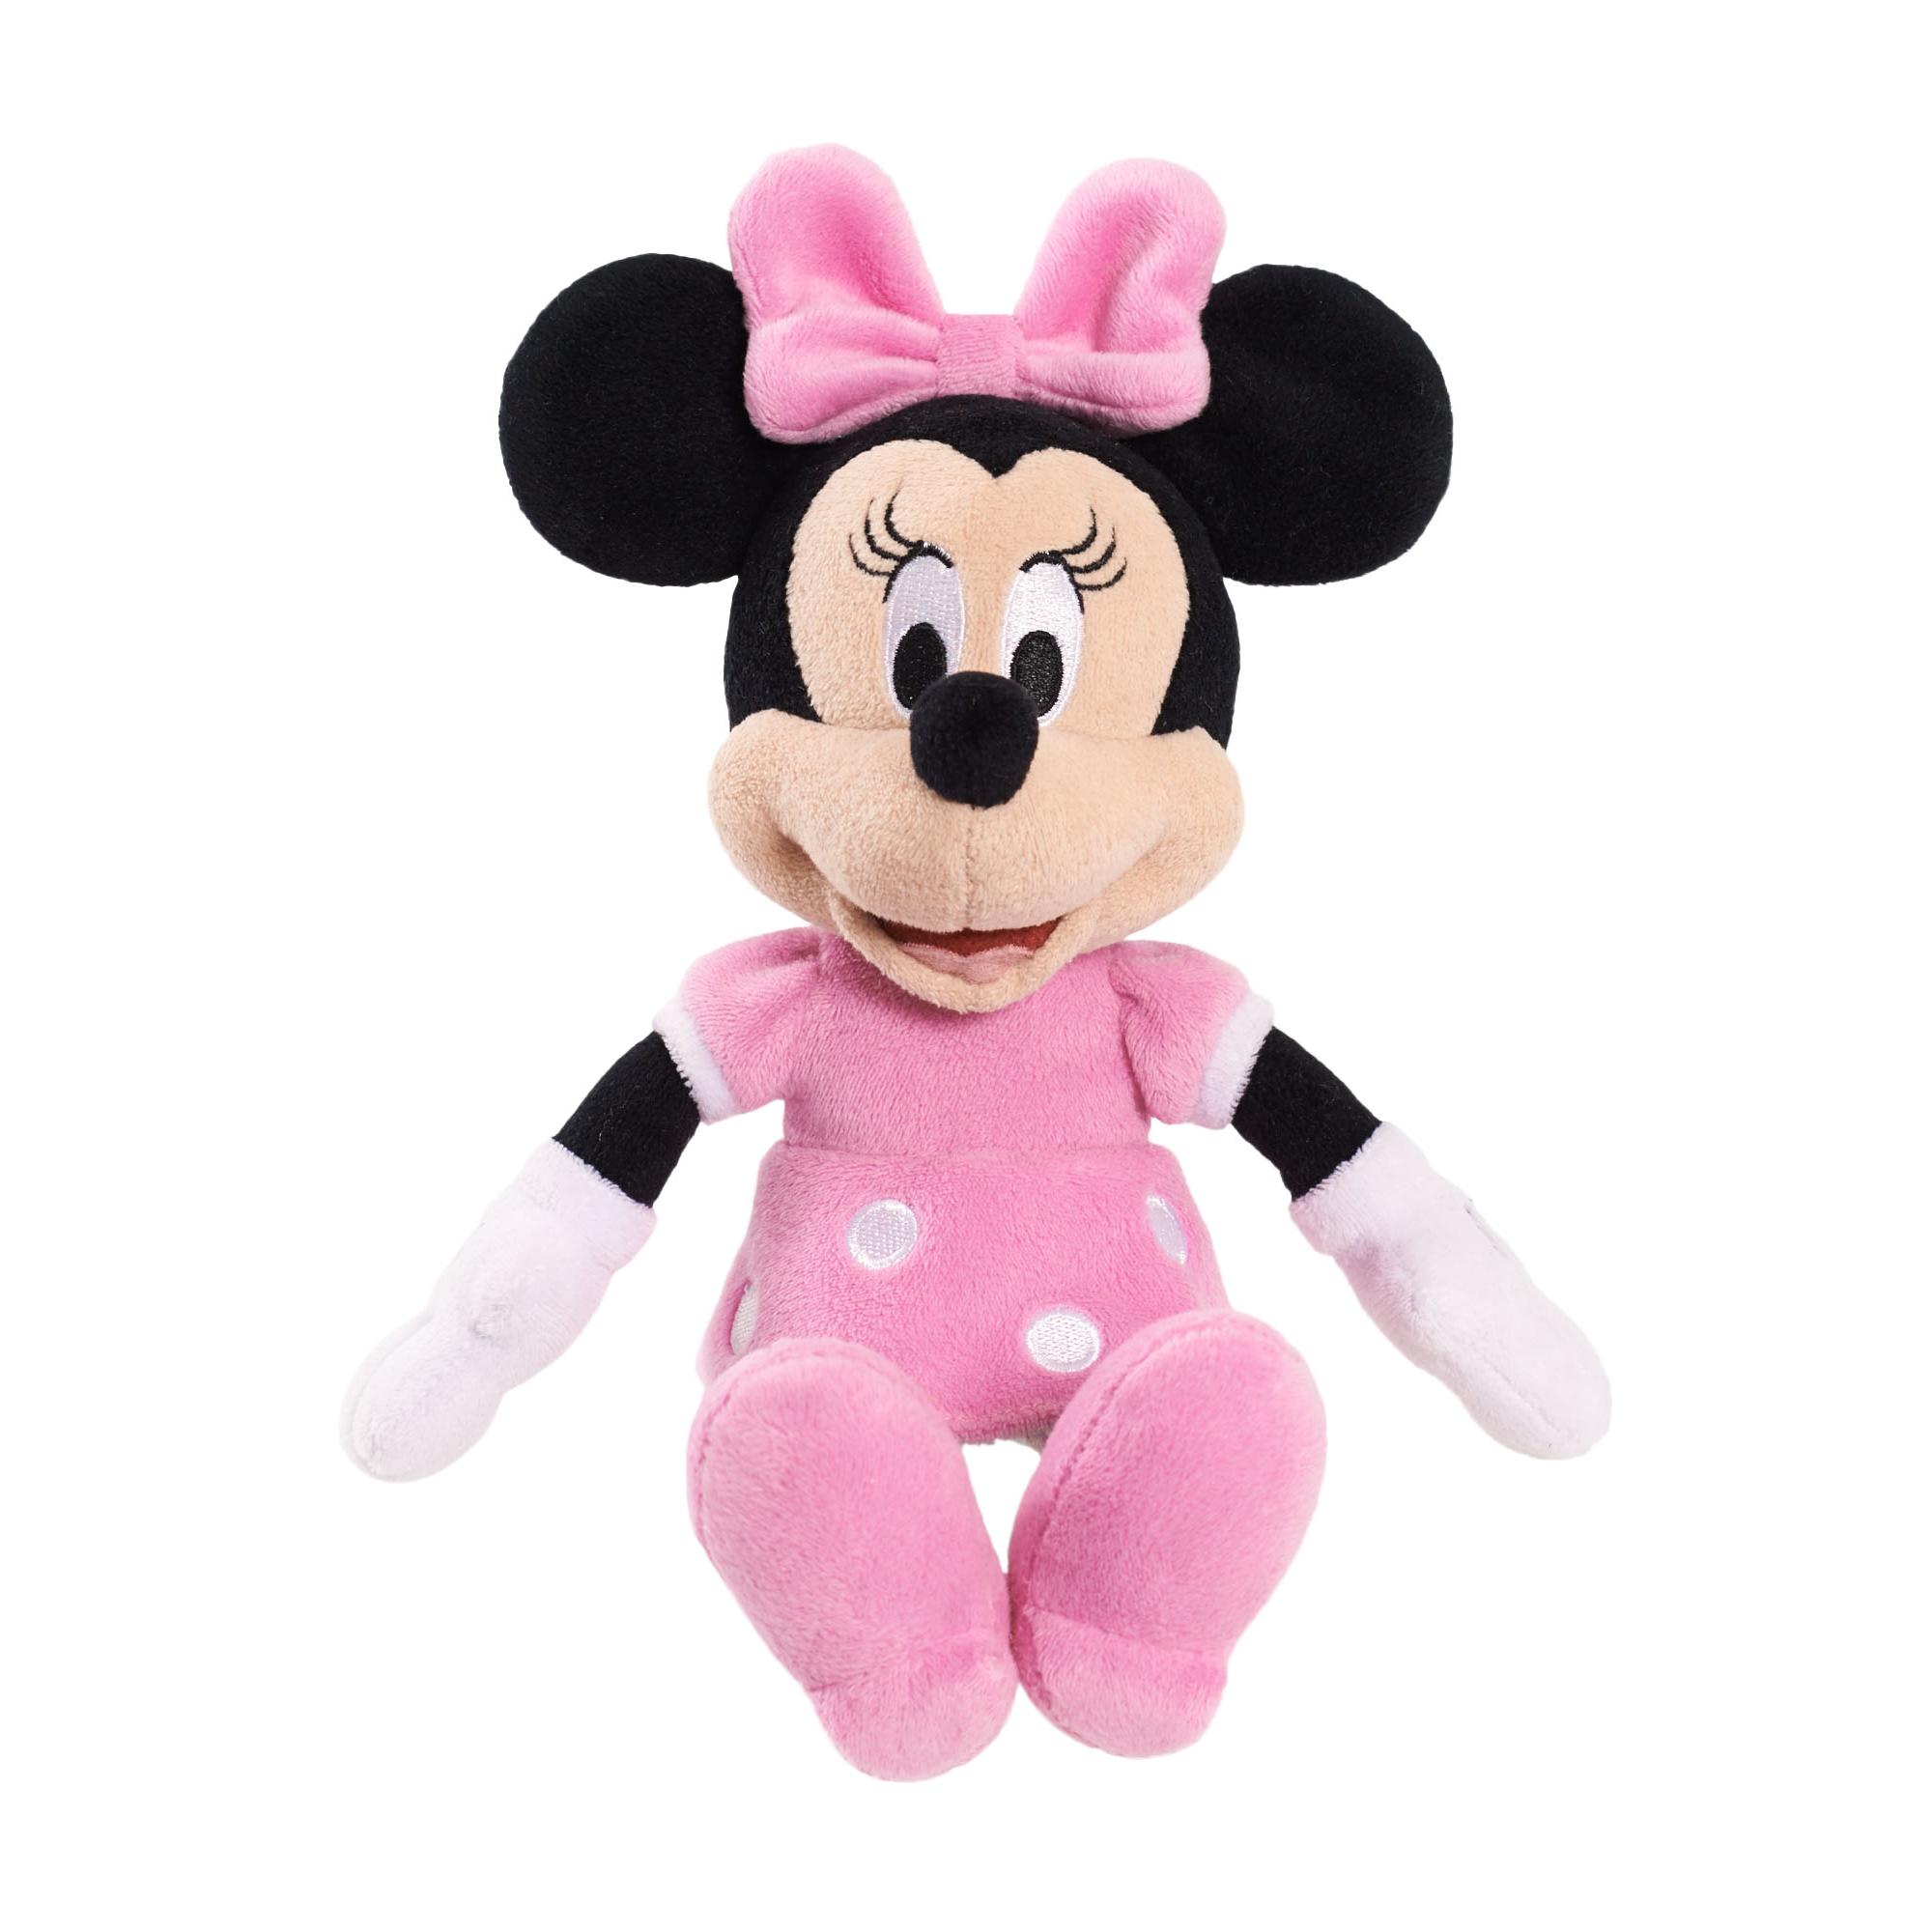 Minnie Mouse Bean Plush - Minnie in Pink Dress